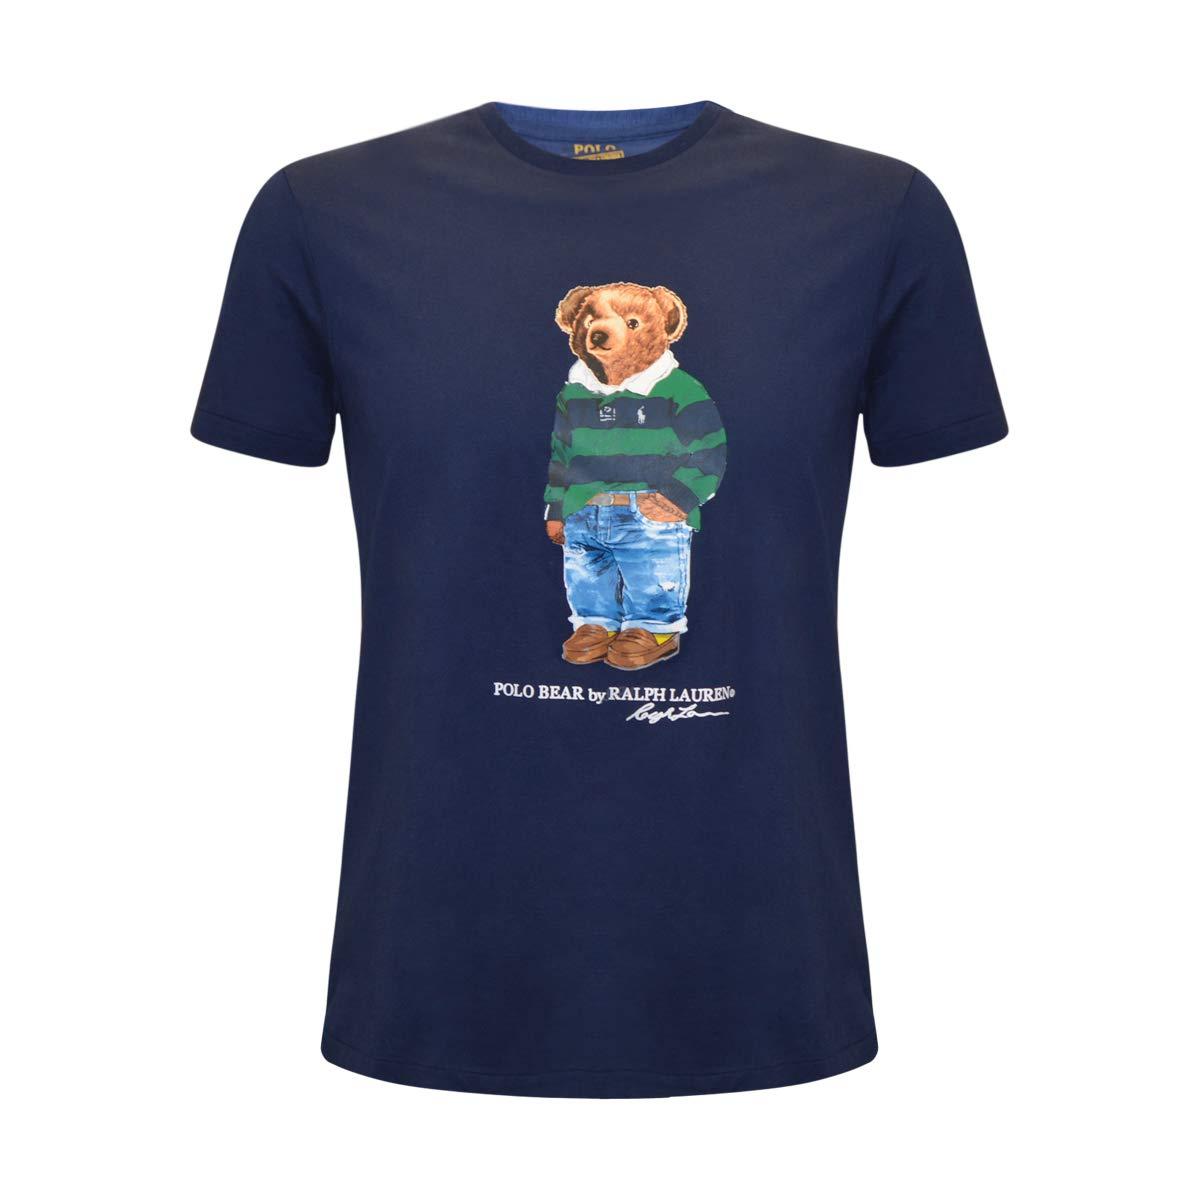 9fb5d5de9 Amazon.com  Polo Ralph Lauren Mens Limited Polo Bear T-Shirt  Clothing